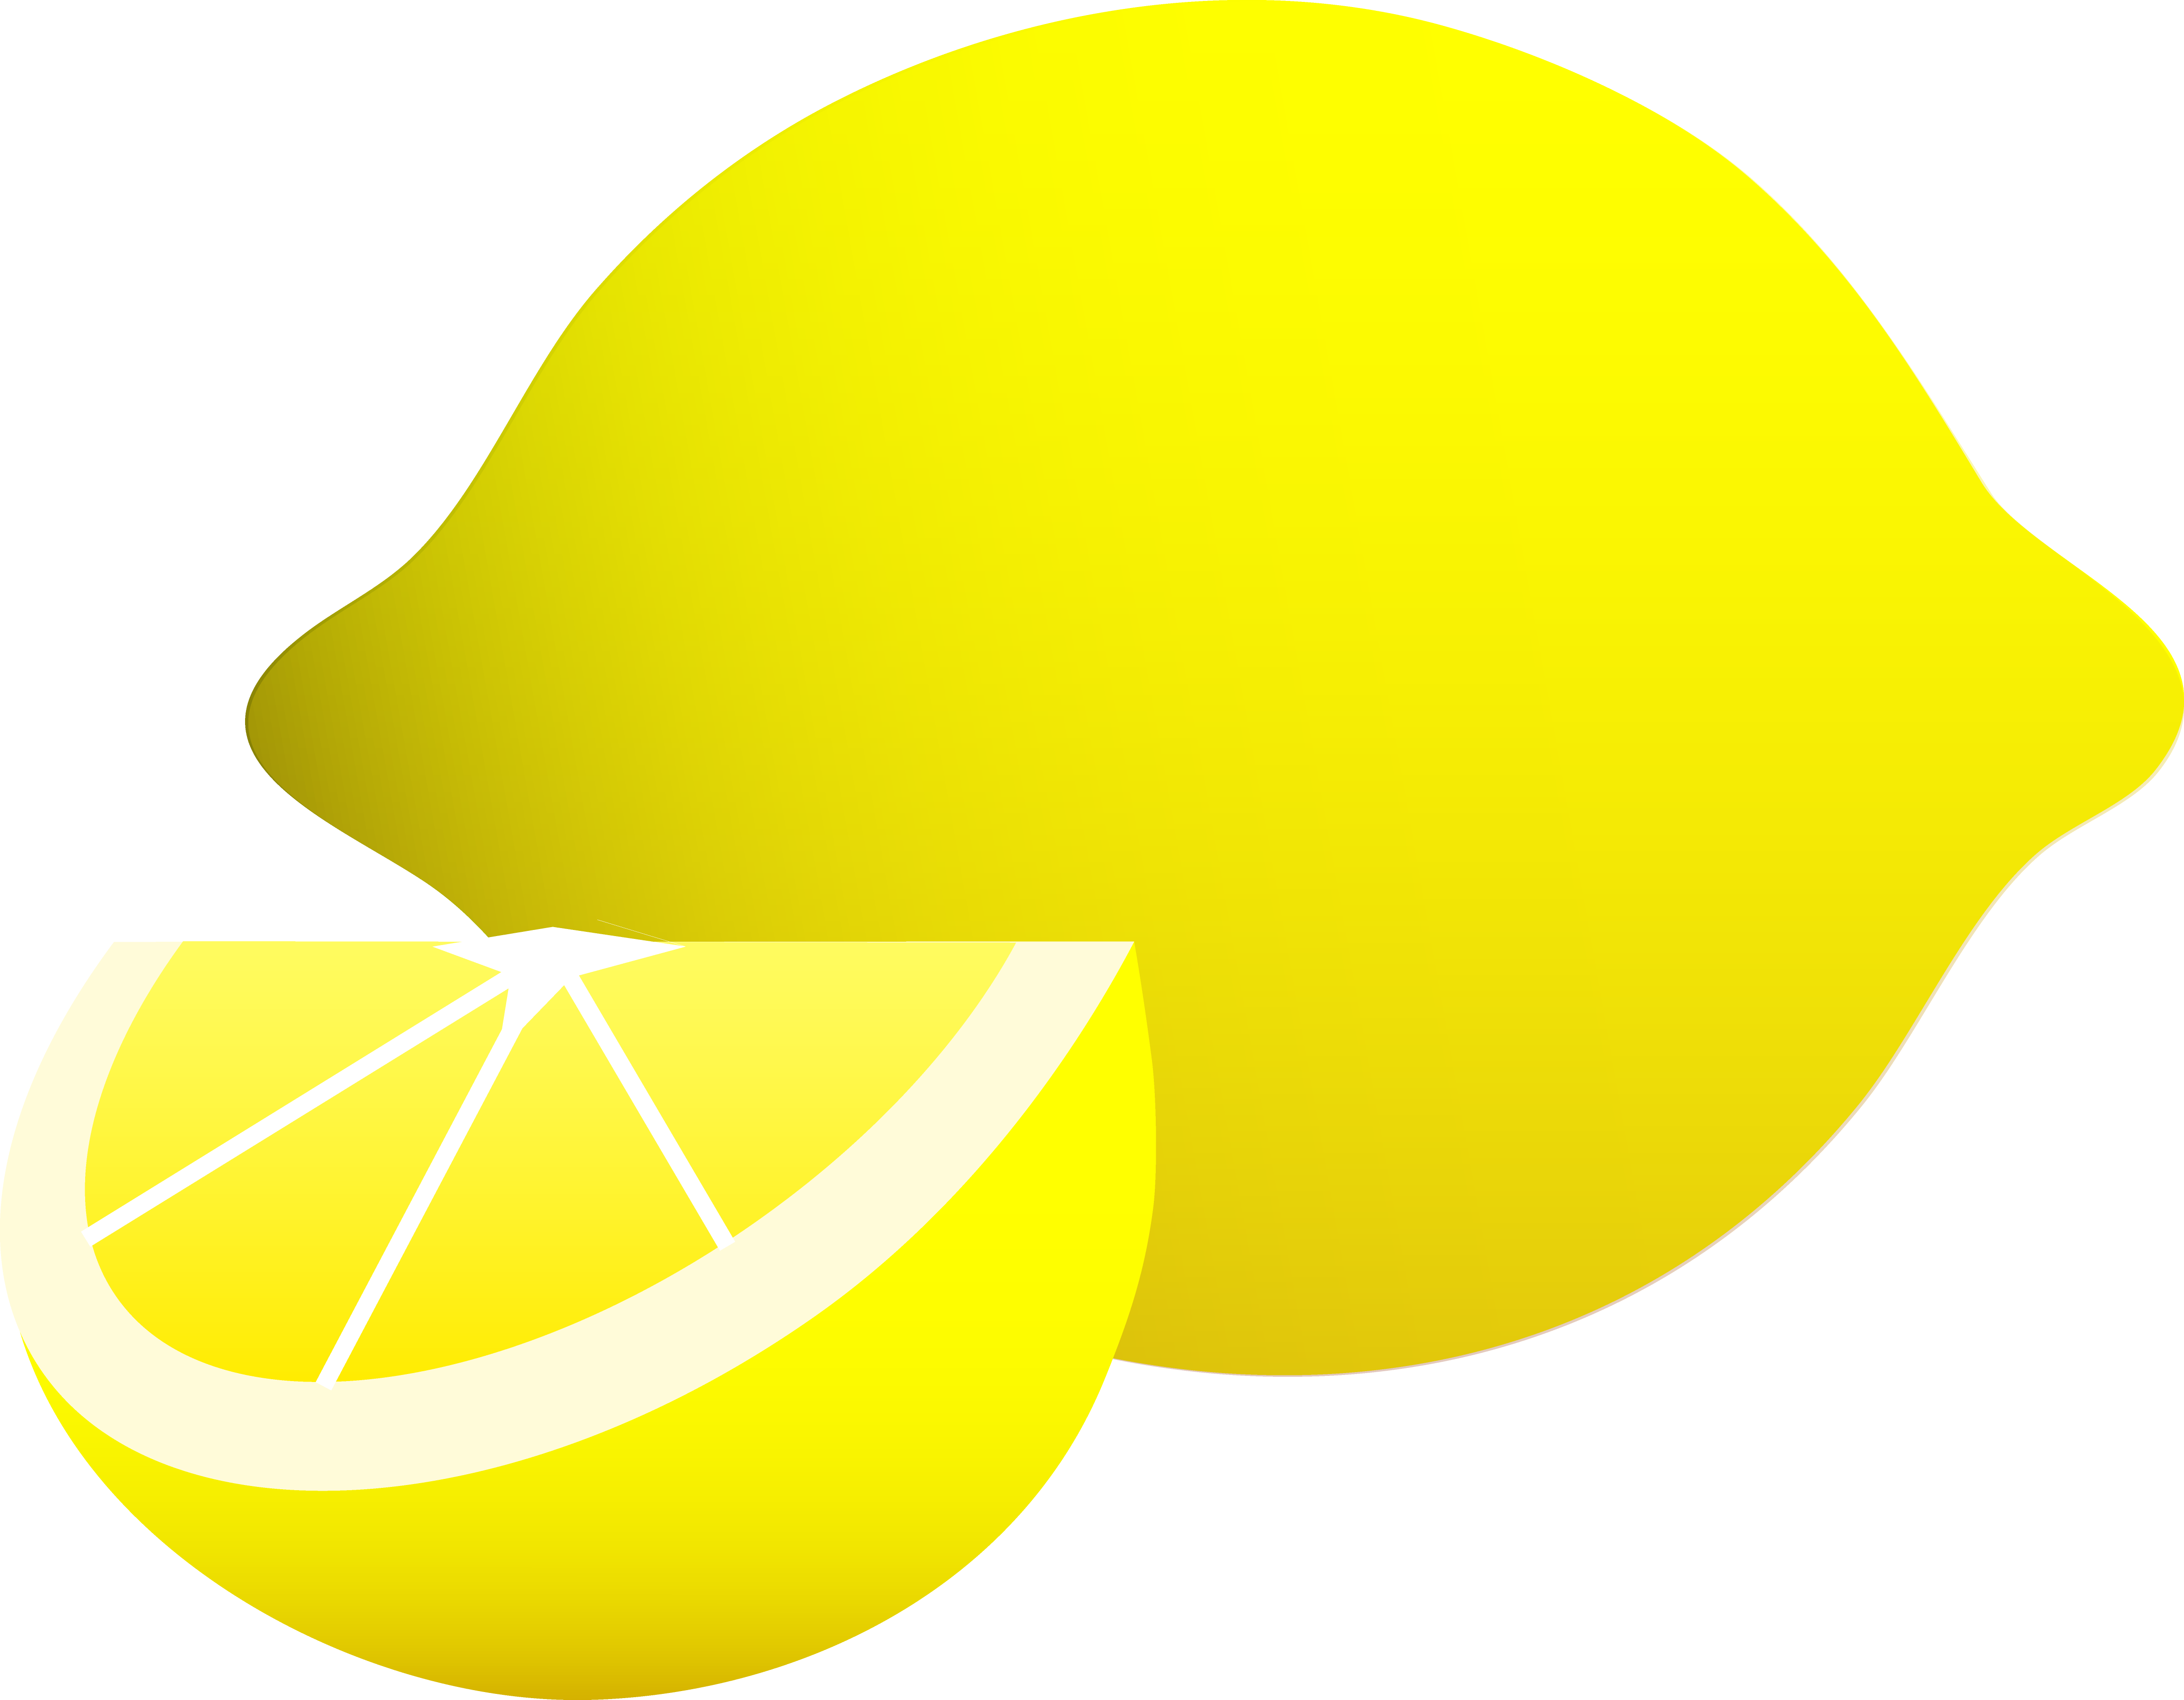 Lemon wedge drawing at. Lemons clipart face